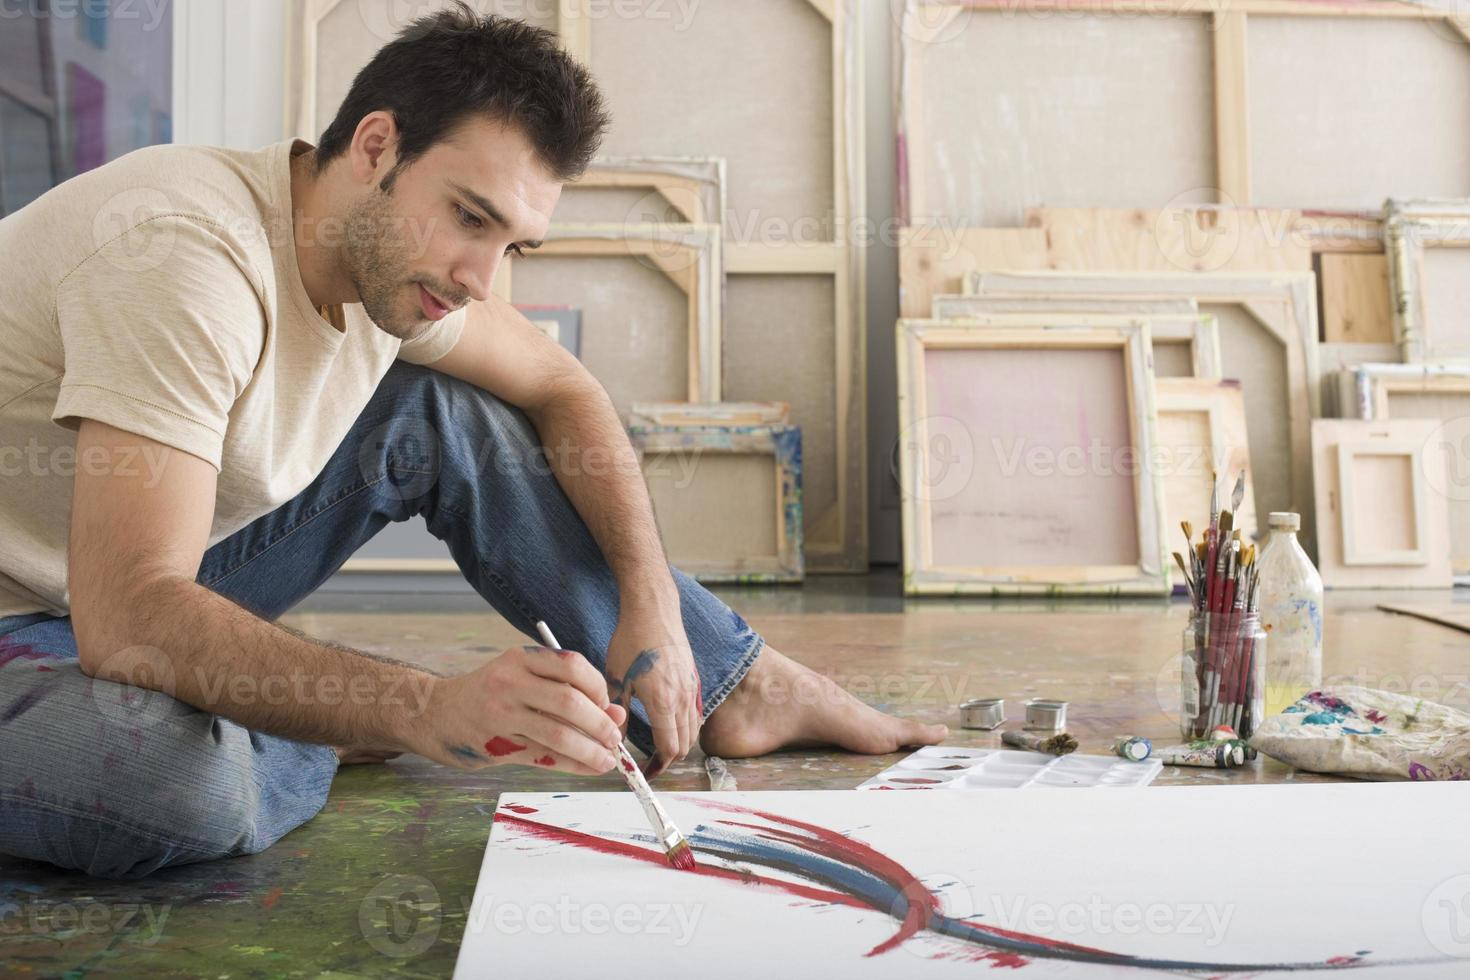 Mann malt auf Leinwand foto